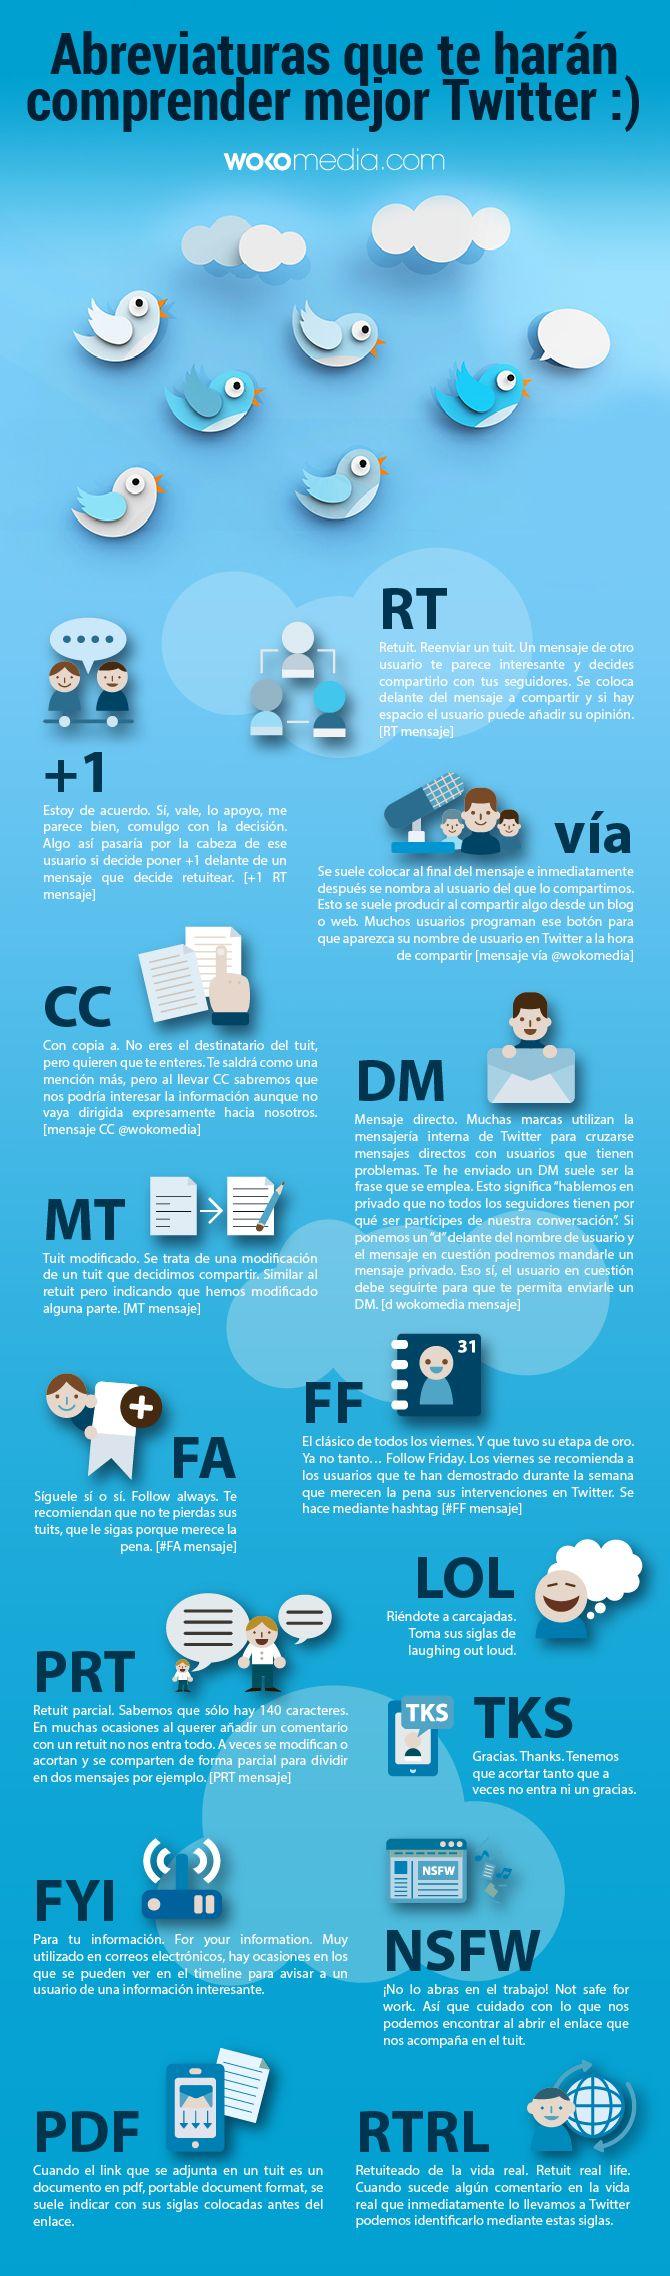 infografia-abreviaturas-twitter-compressor